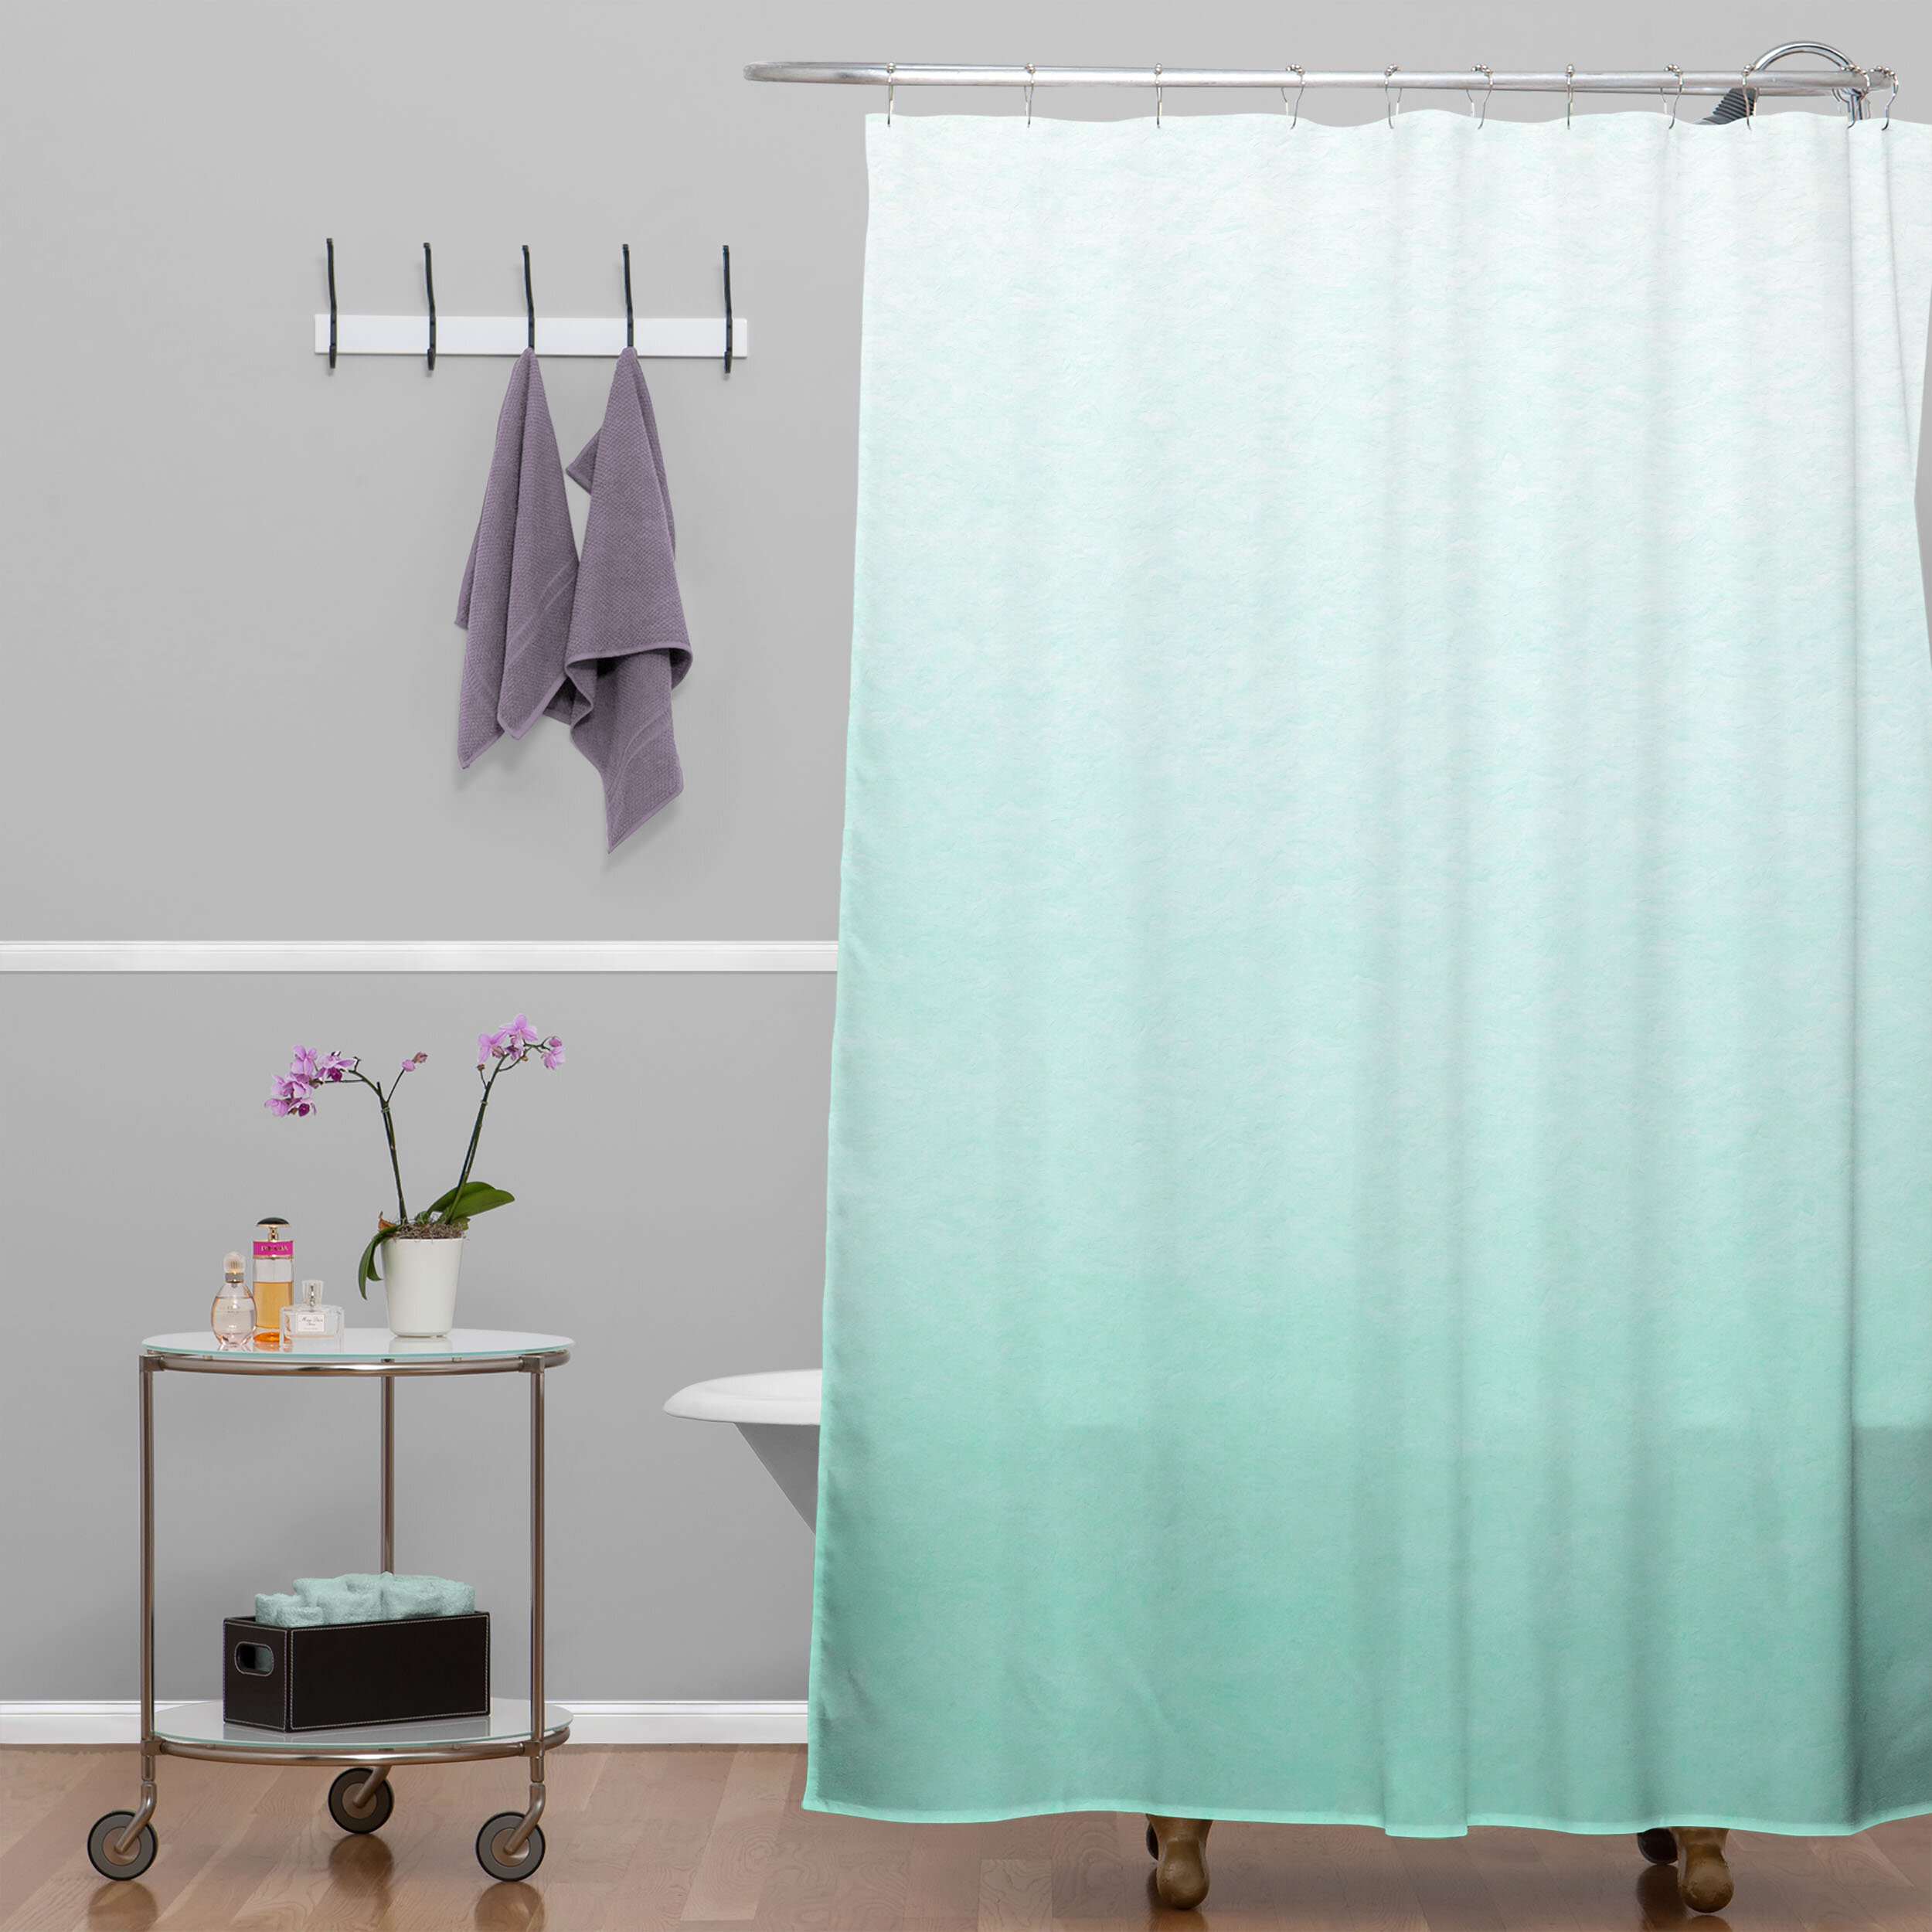 Mint And Grey Shower Curtain.  Brayden Studio Kessinger Mint Ombre Shower Curtain Reviews Wayfair